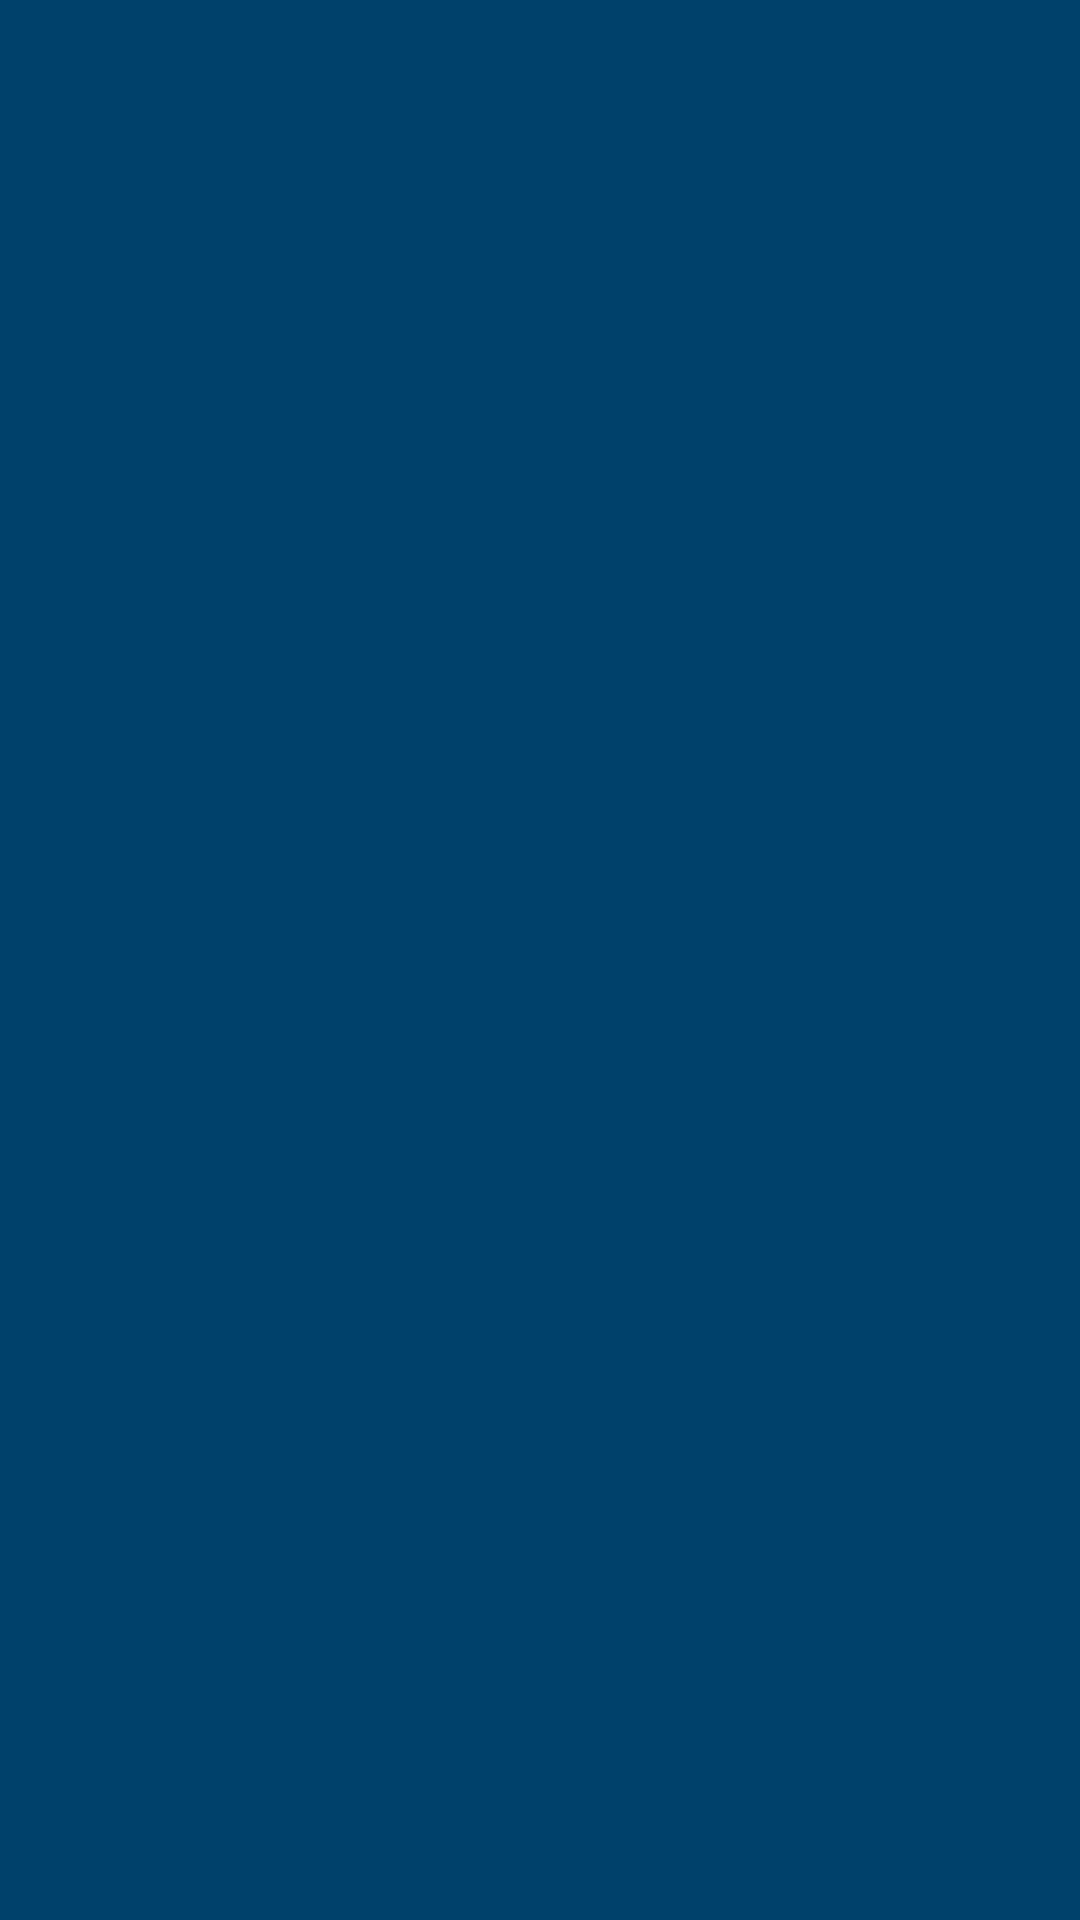 1080x1920 Indigo Dye Solid Color Background